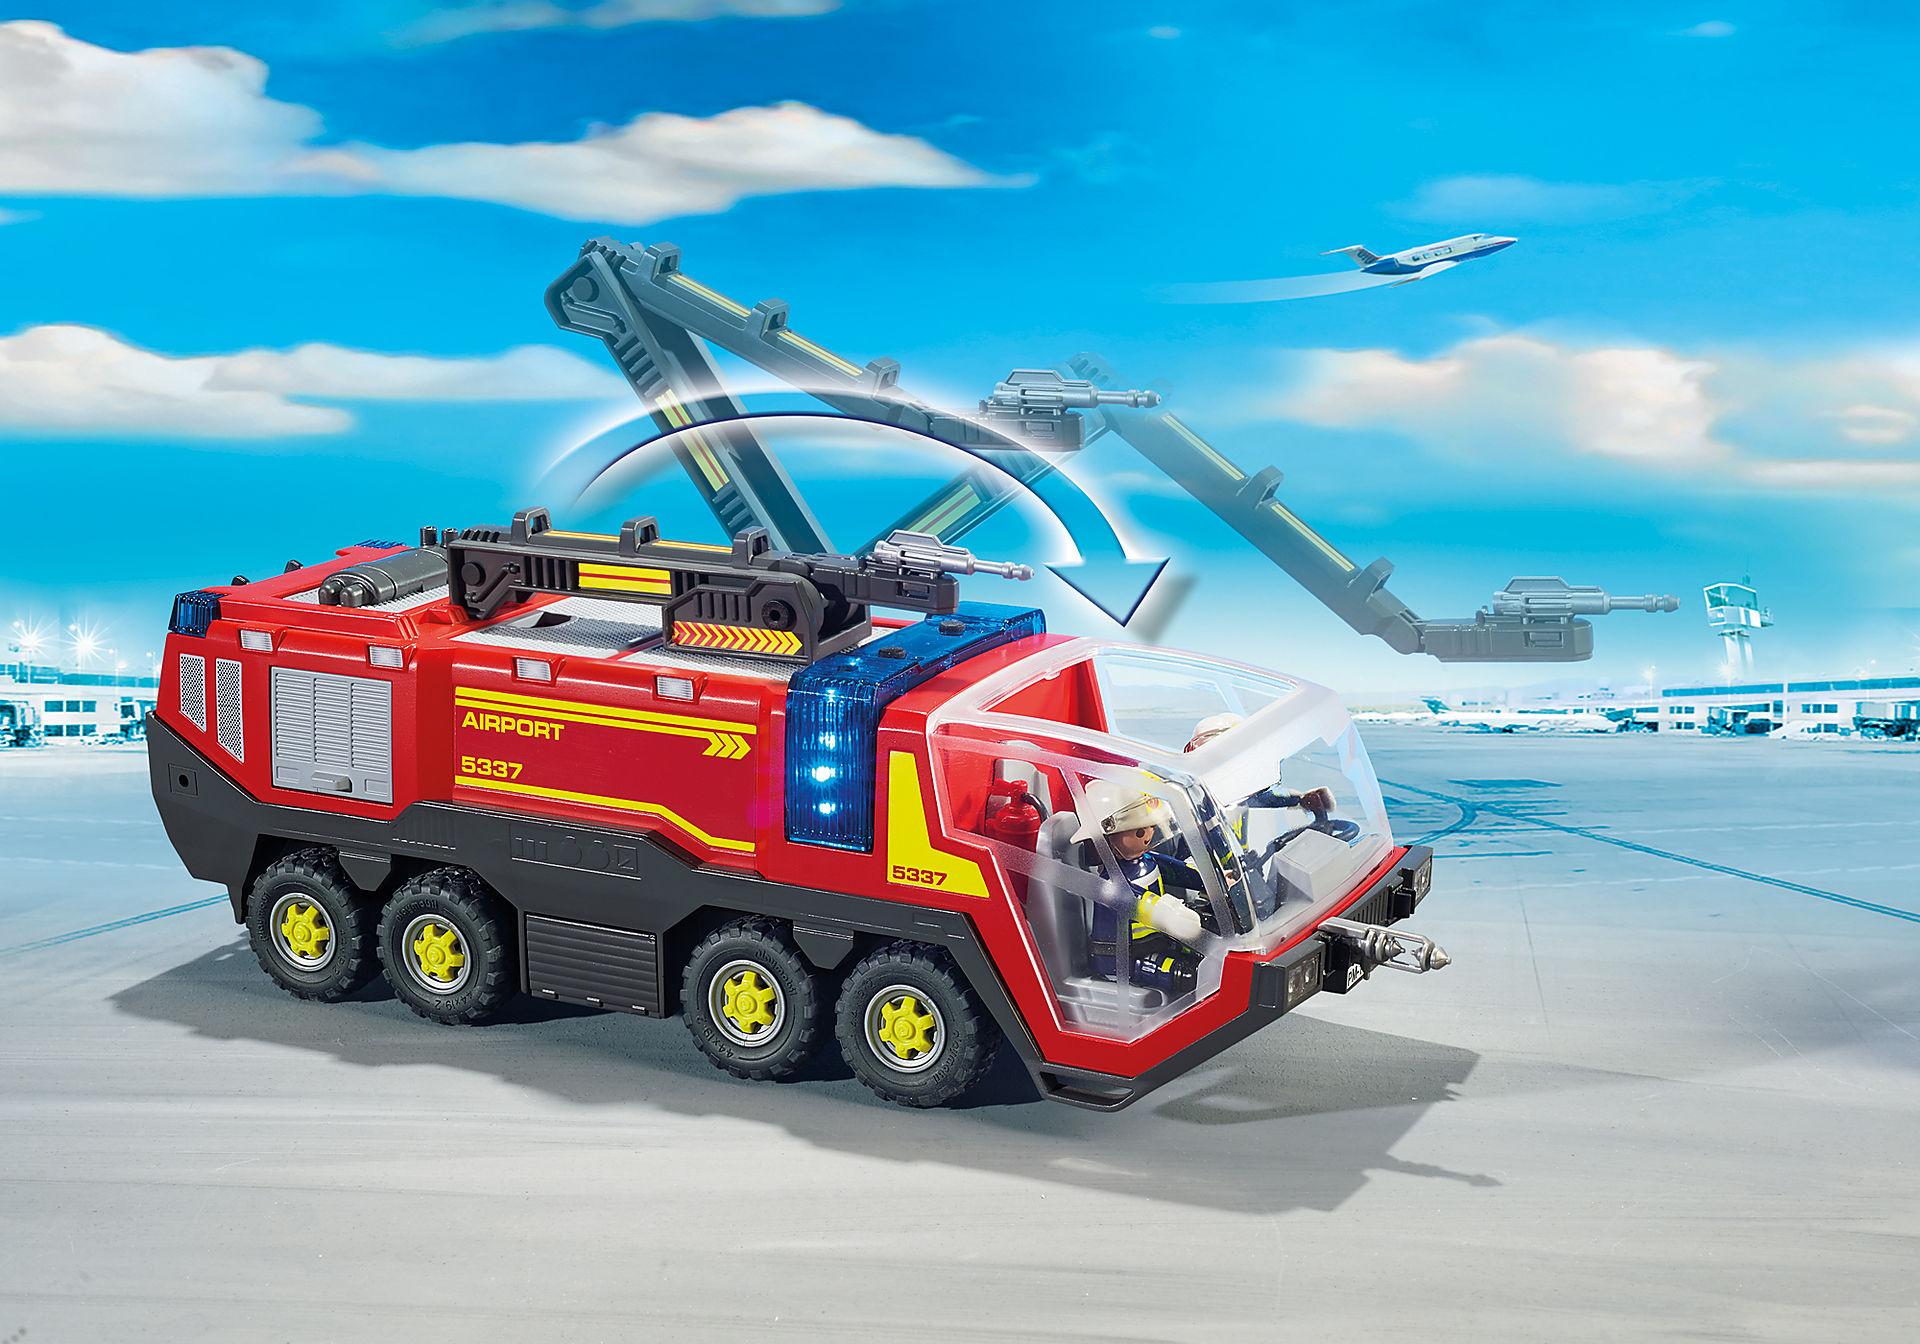 http://media.playmobil.com/i/playmobil/5337_product_extra4/Camión Bomberos Aeropuerto